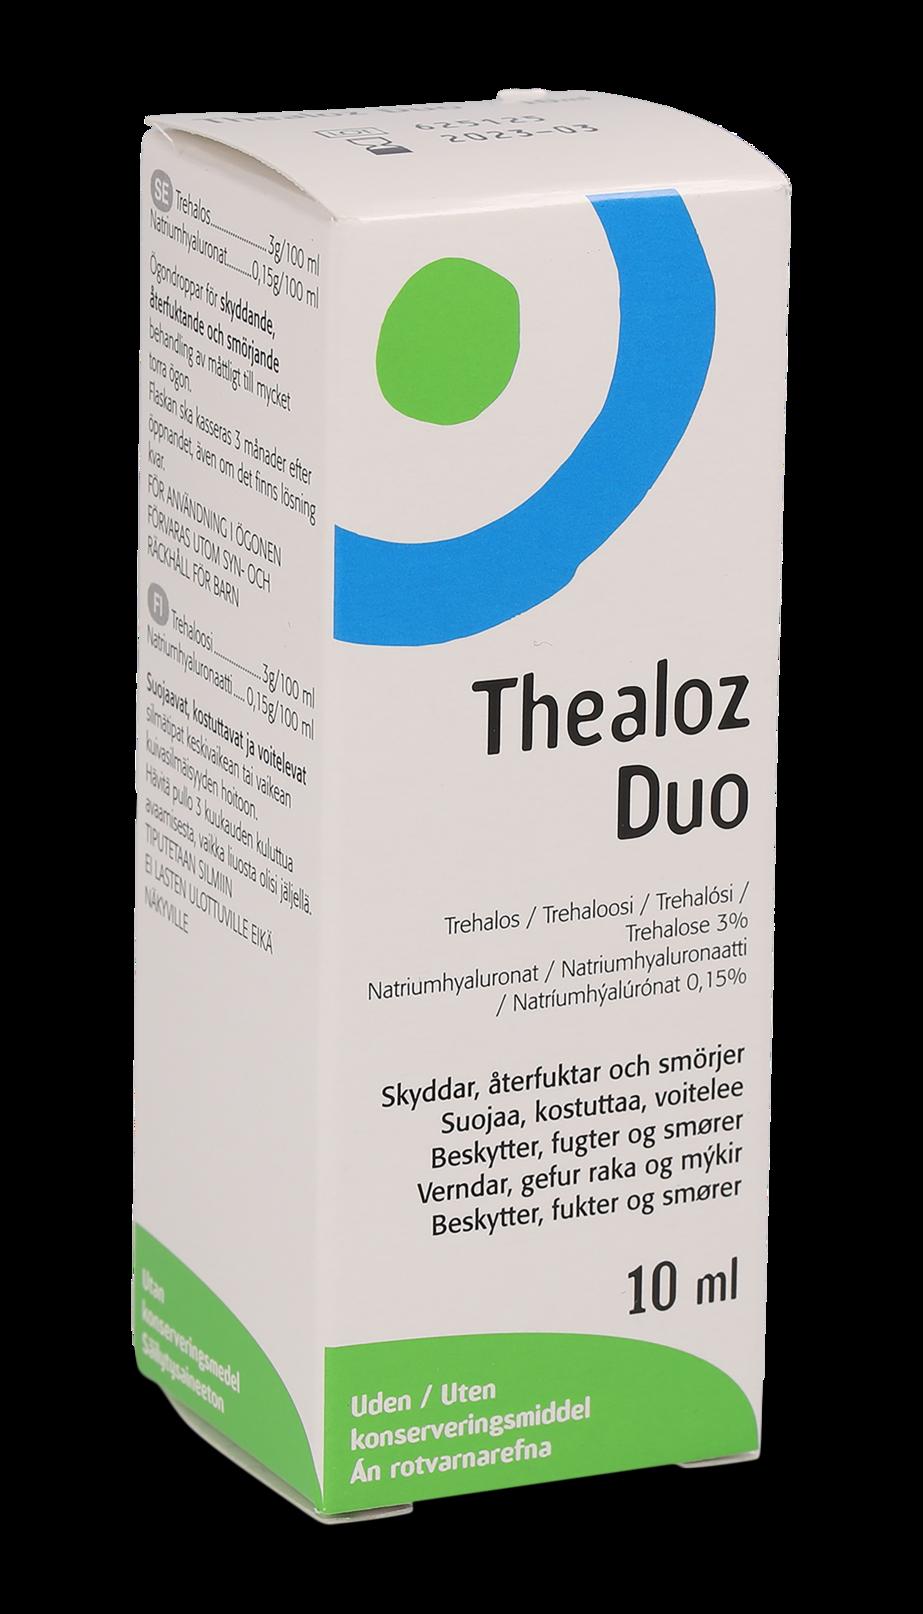 Angle_Right01 Thealoz Duo Thealoz Duo